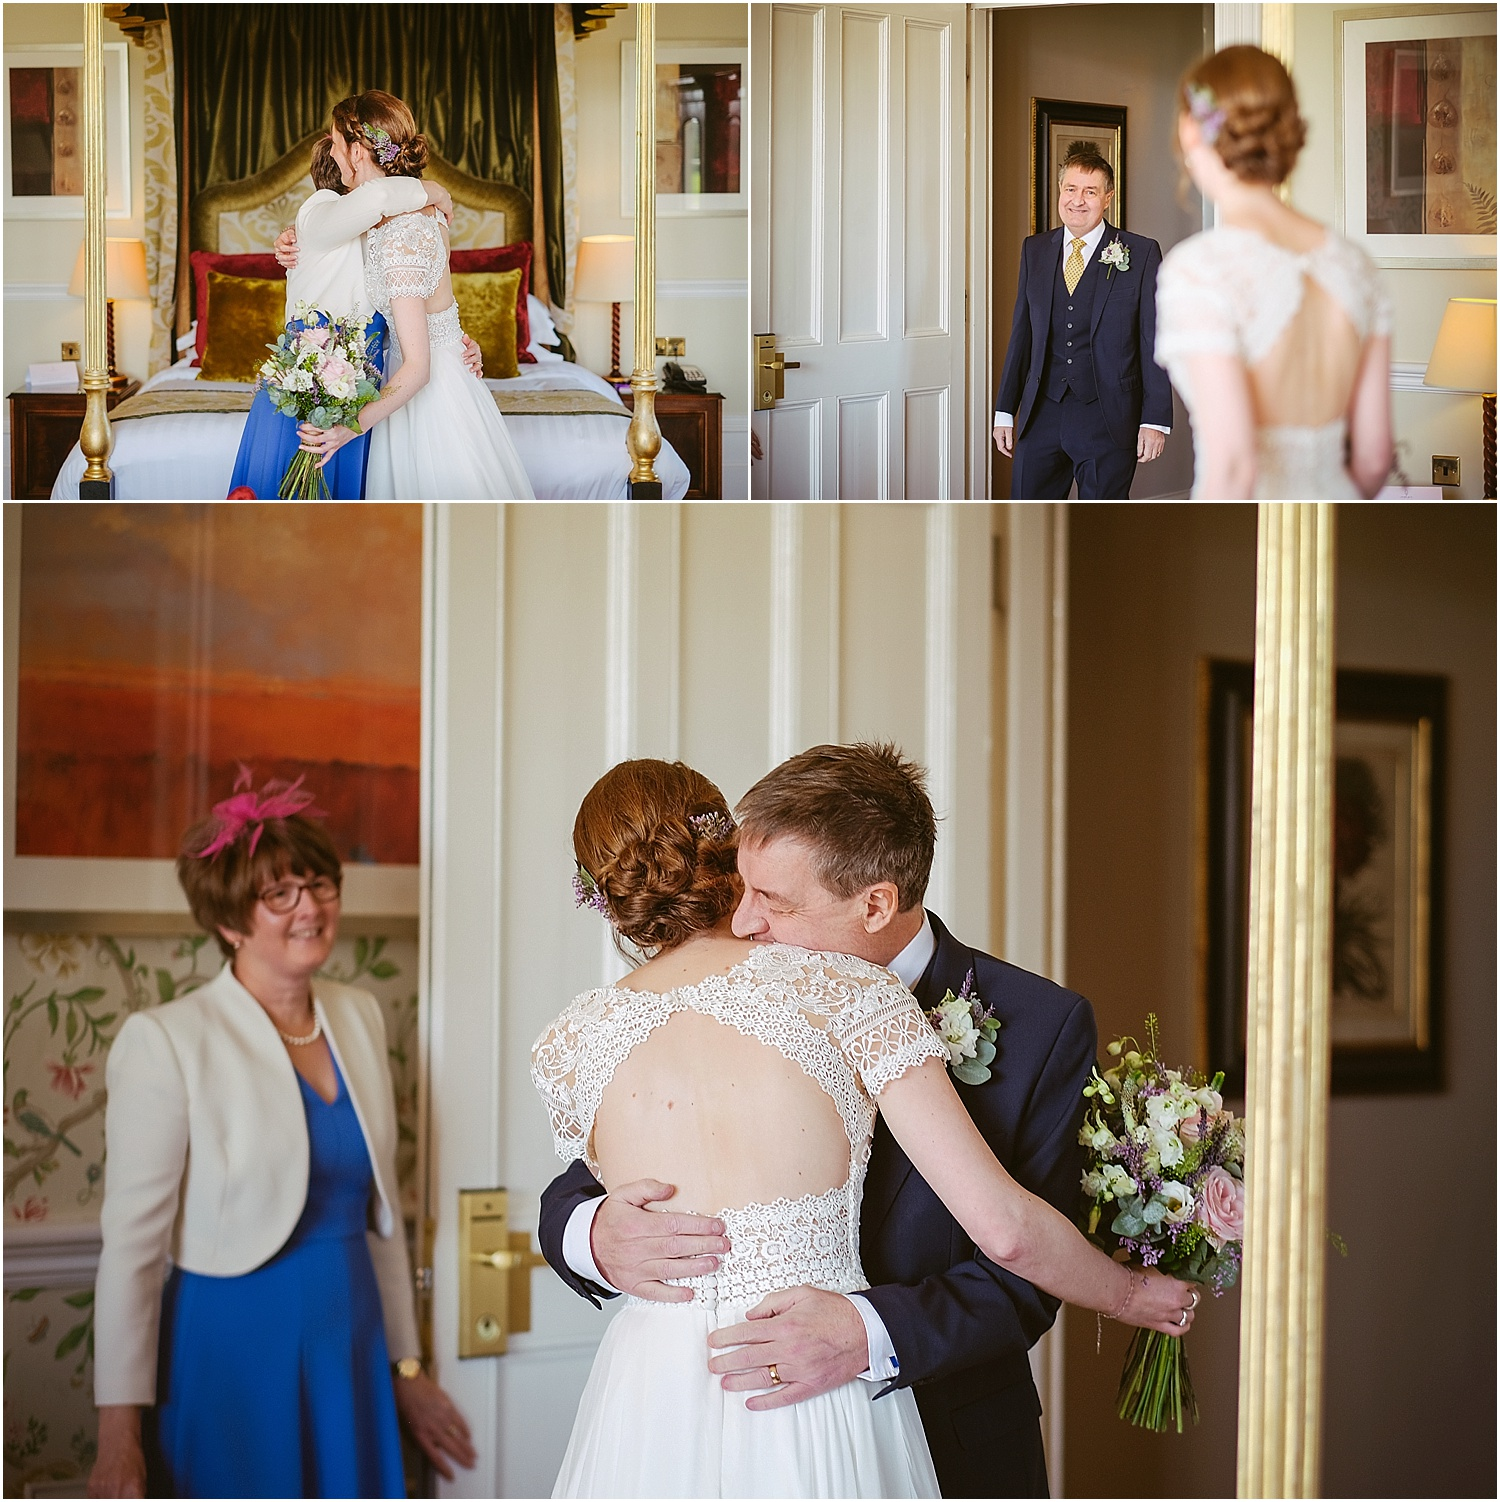 Wedding photos at Matfen Hall 010.jpg